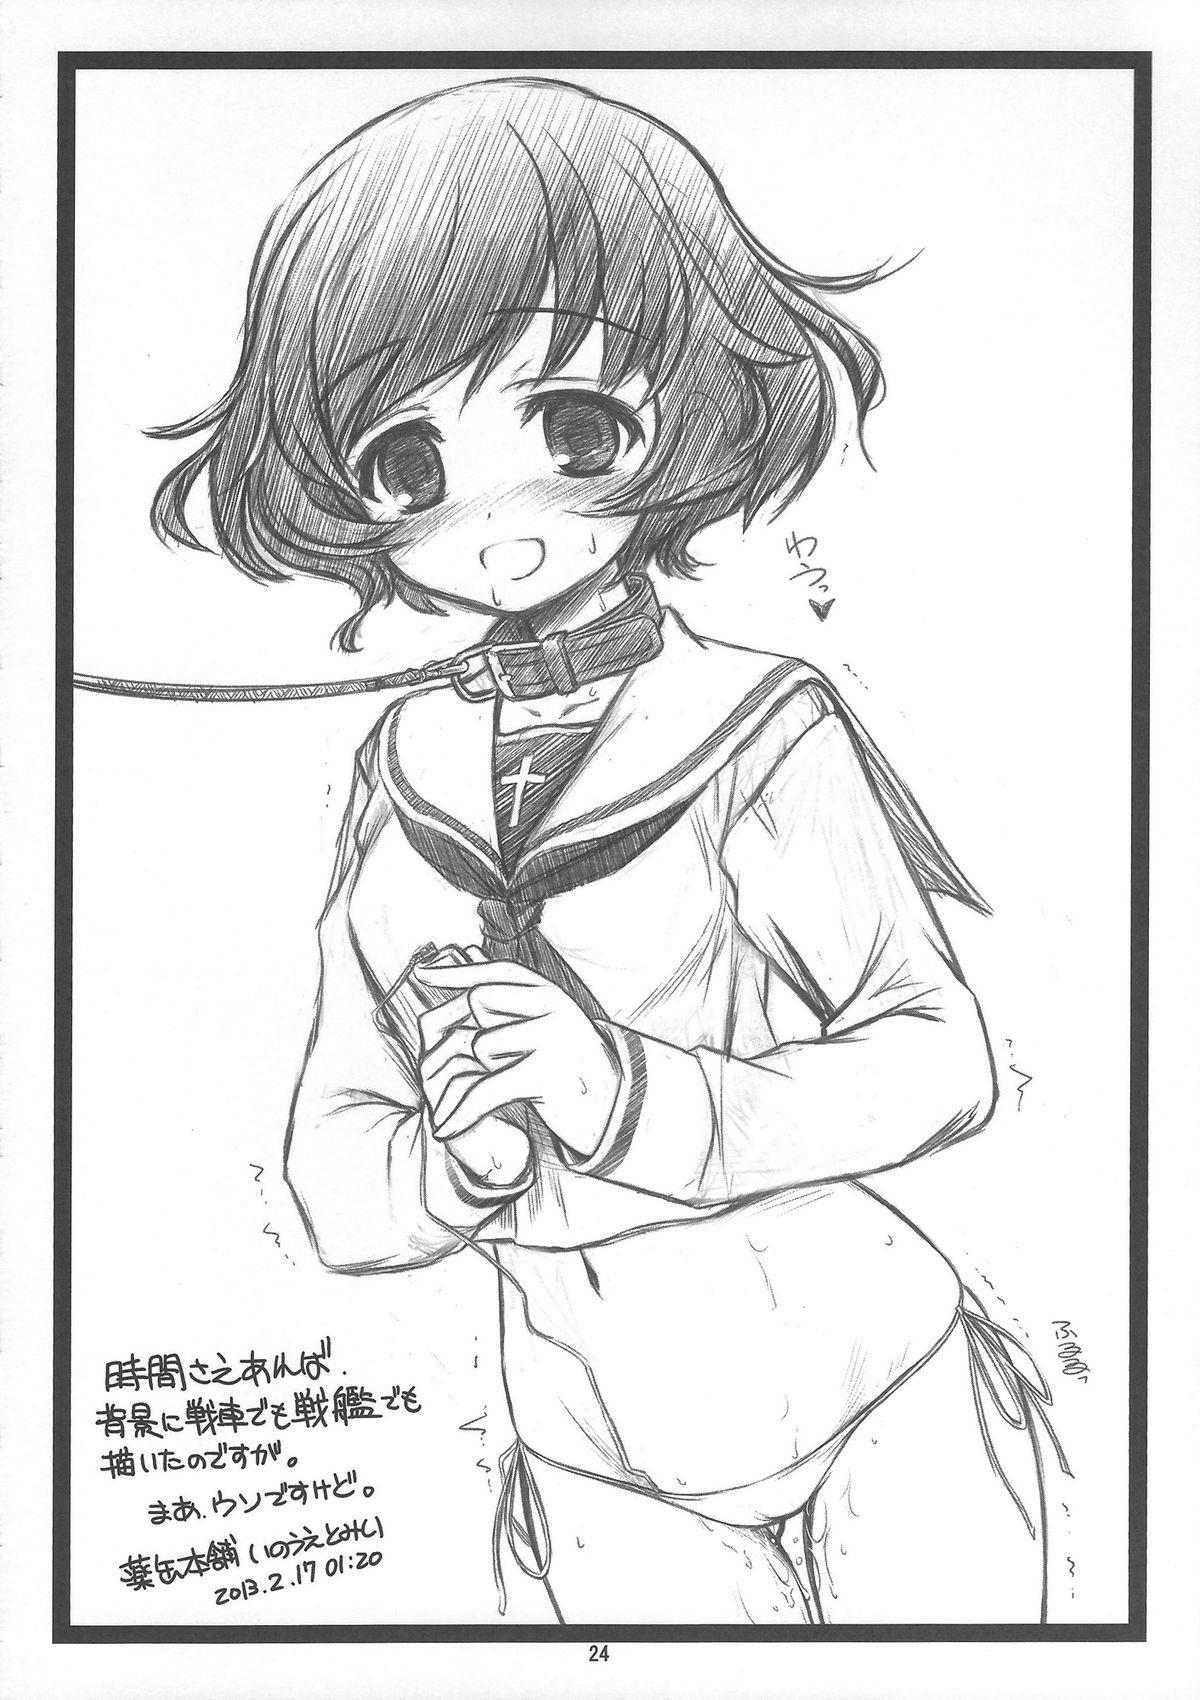 (C84) [bolze.] 「Honanie + Akiyama-dono Sennyudaisakusen (Sippai)」 (Girls und Panzer) 23